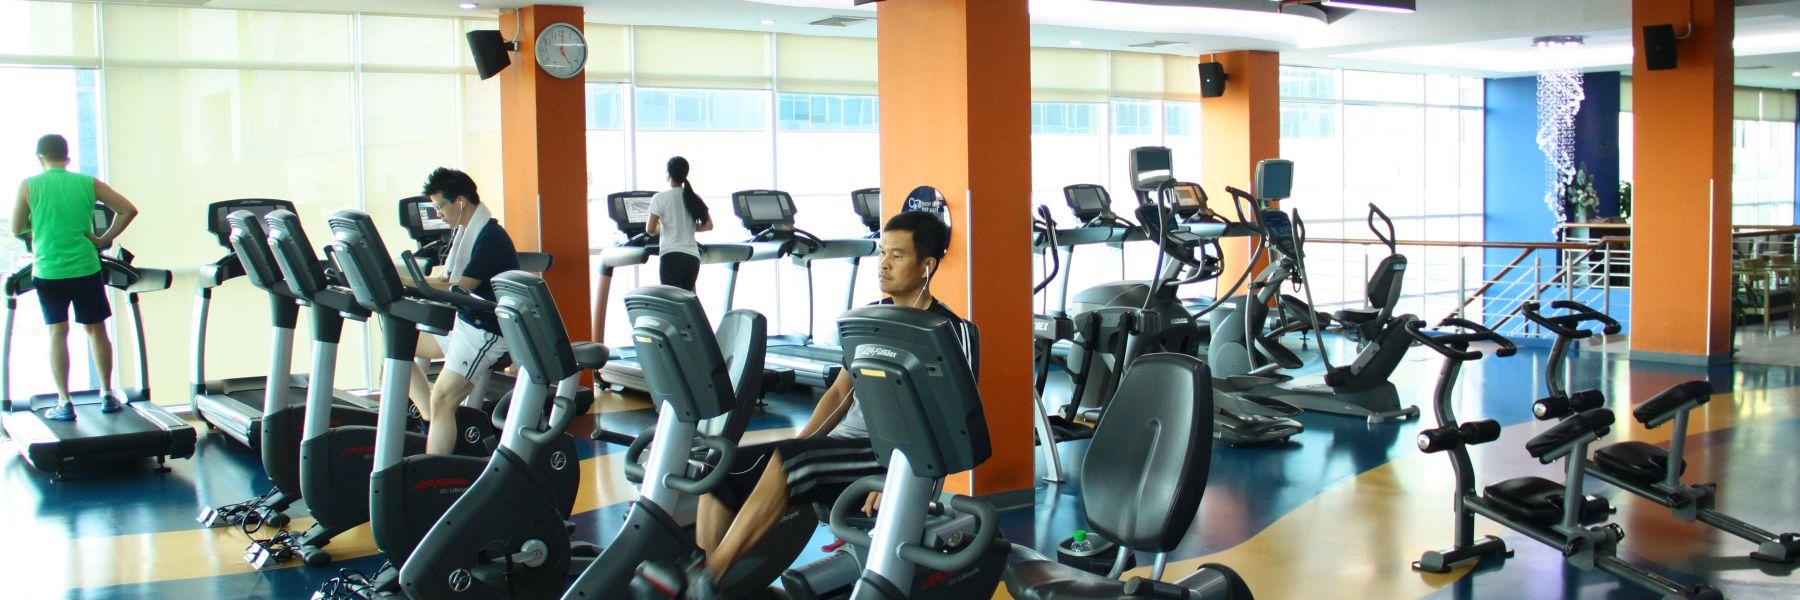 O2 Fitness - Park Village image Cardio Zone